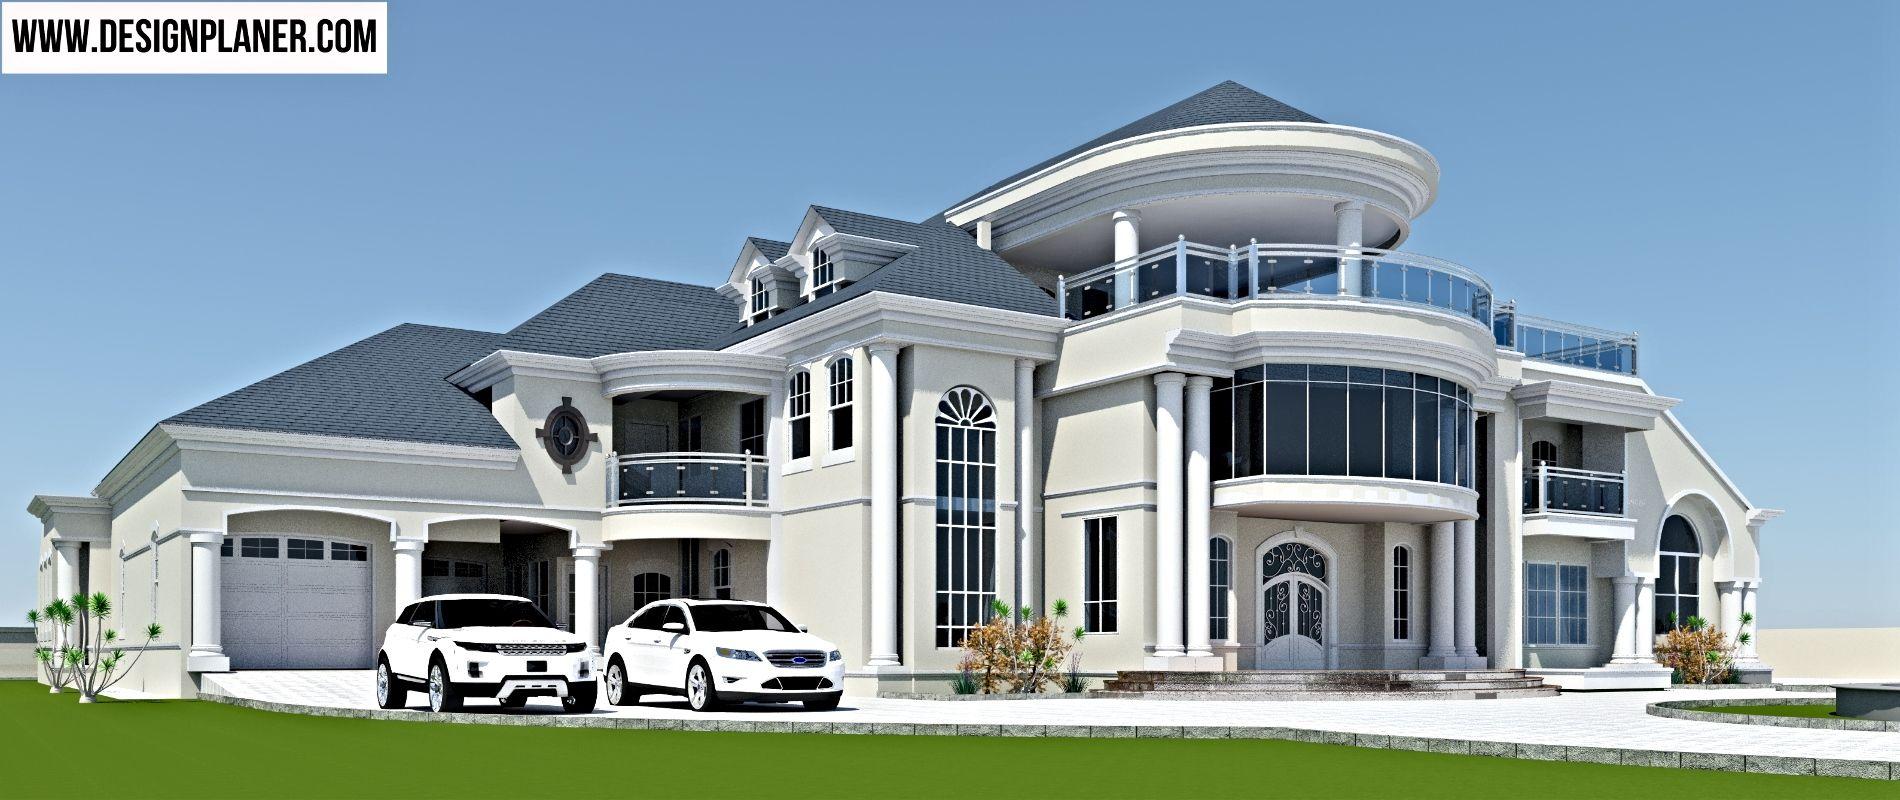 Our Services Includes Architectural Design Construction